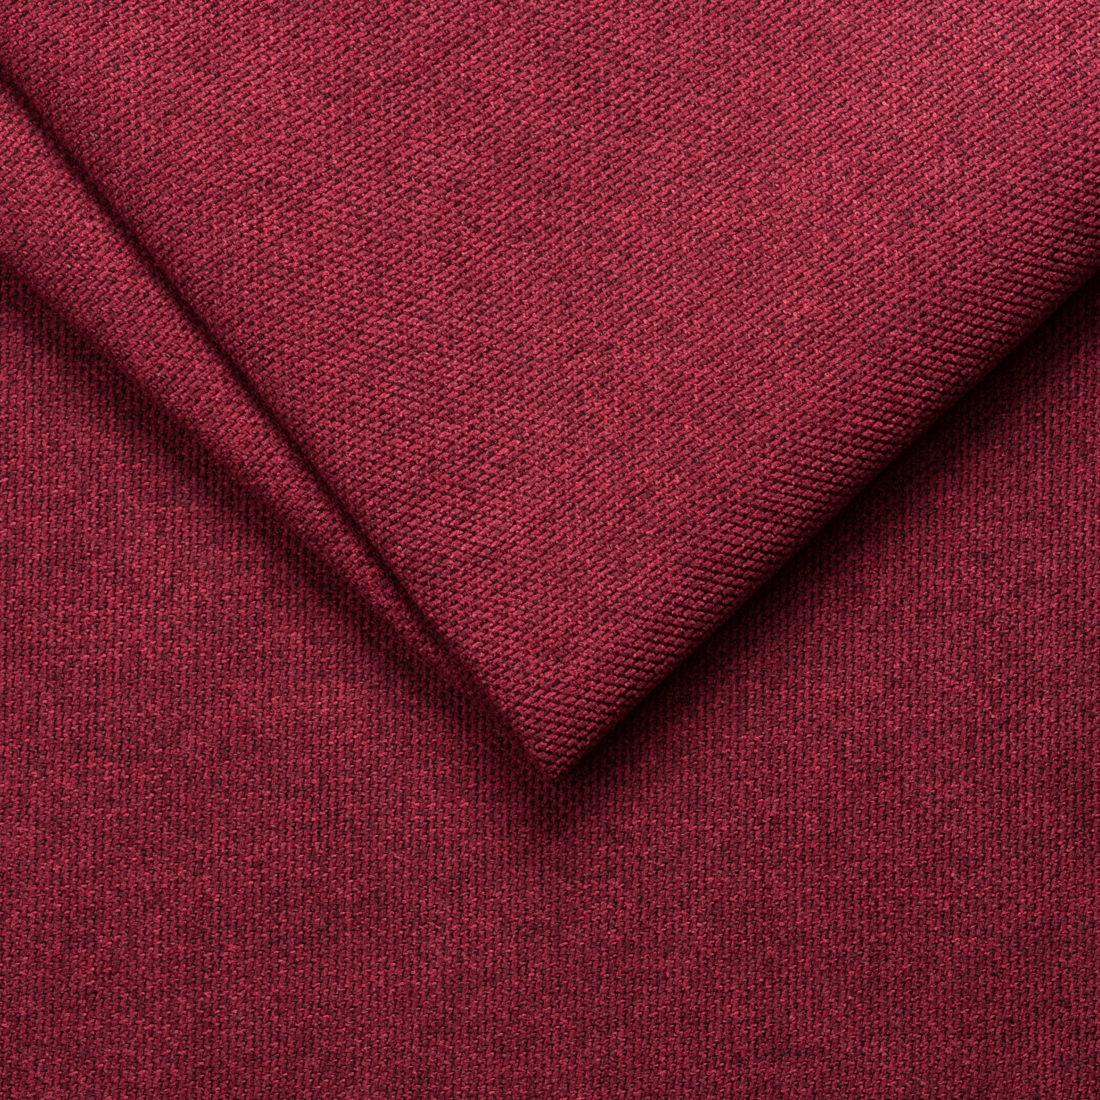 Меблева тканина Austin 8 Ruby Red, рогожка